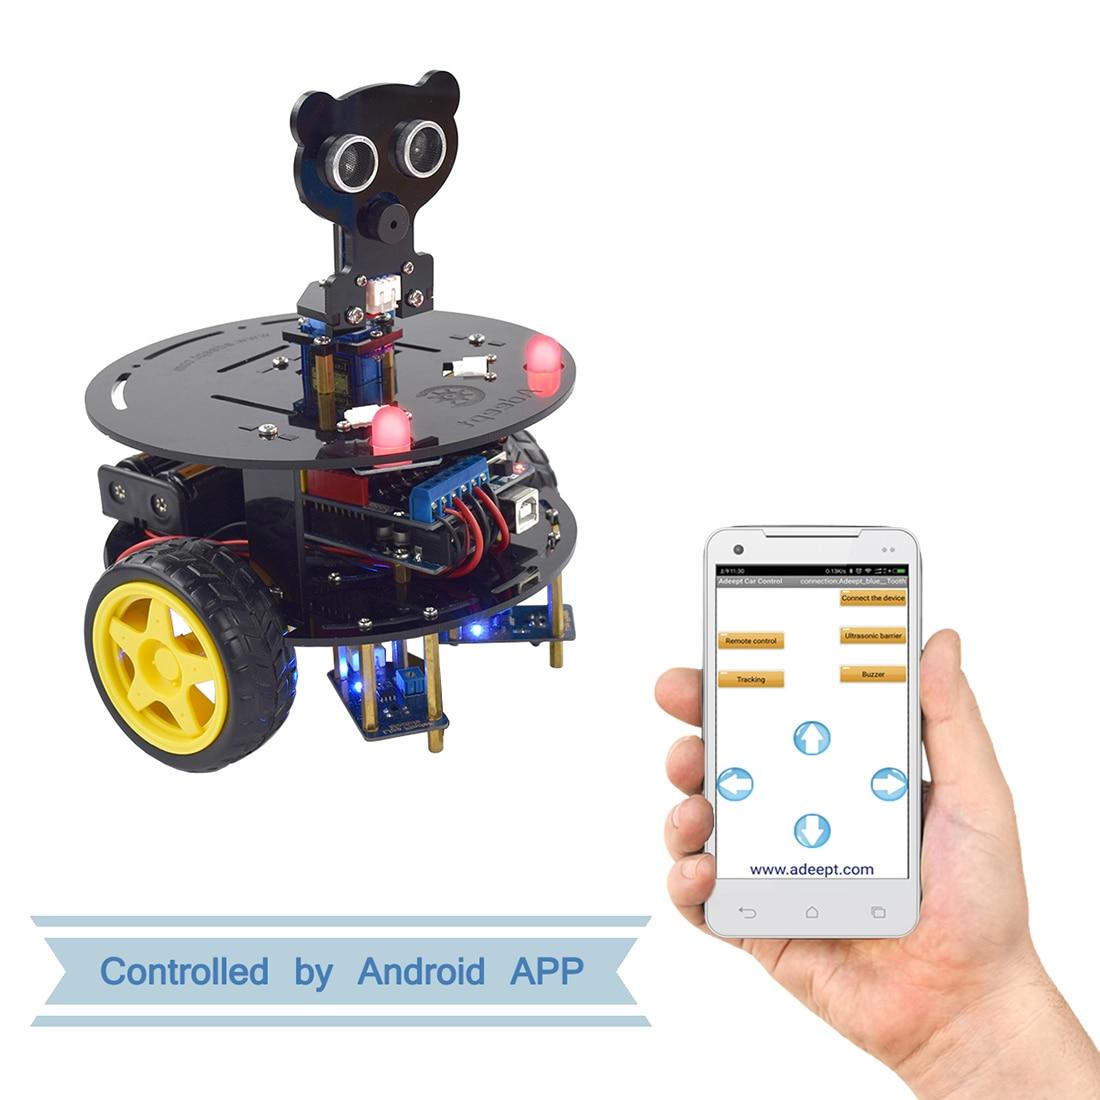 Adeept 3WD Bluetooth inteligente Robot Kit de coche madre Arduino Starter Kit de aprendizaje para Arduino UNO R3 (con placa de desarrollo)